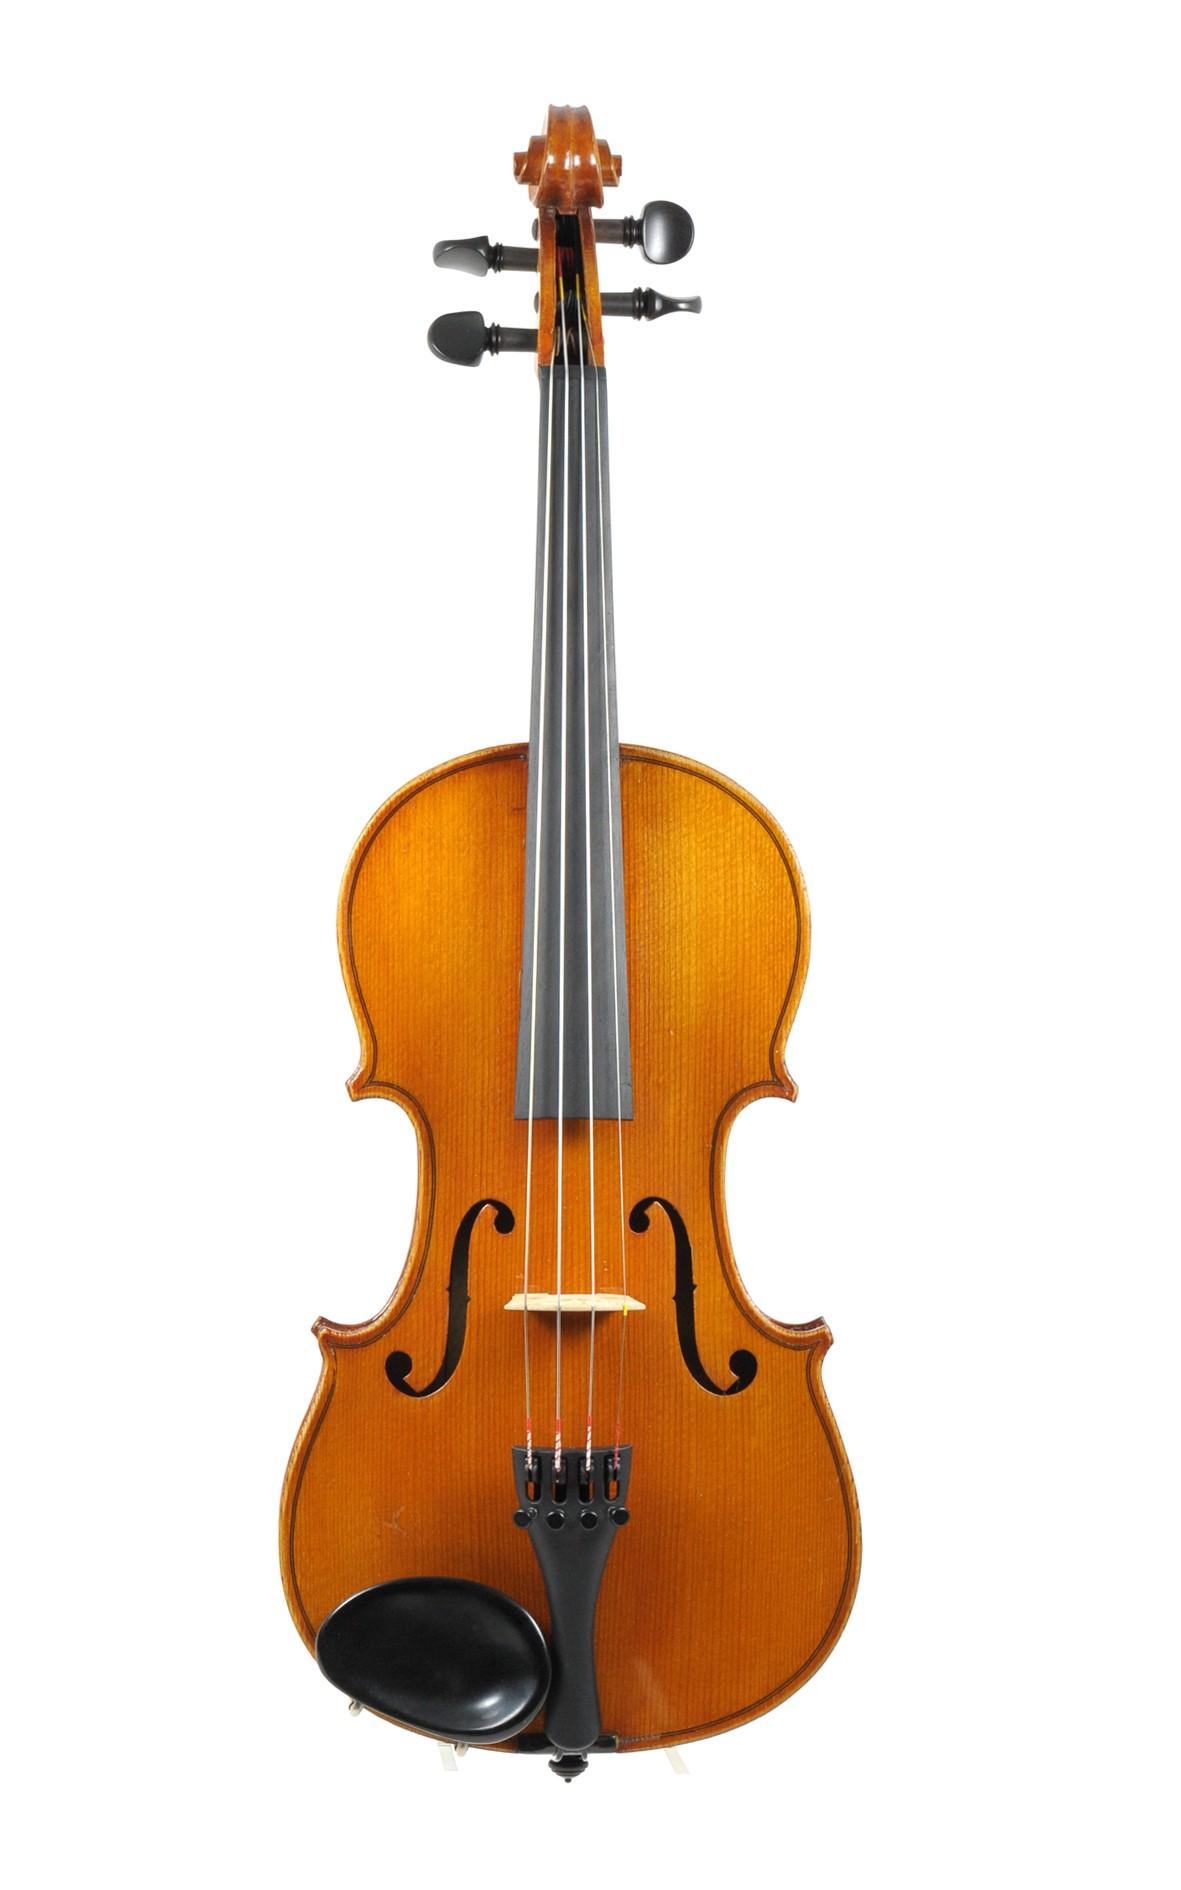 J.T.L. 3/4 violin, Mirecourt, approx. 1900 - top view